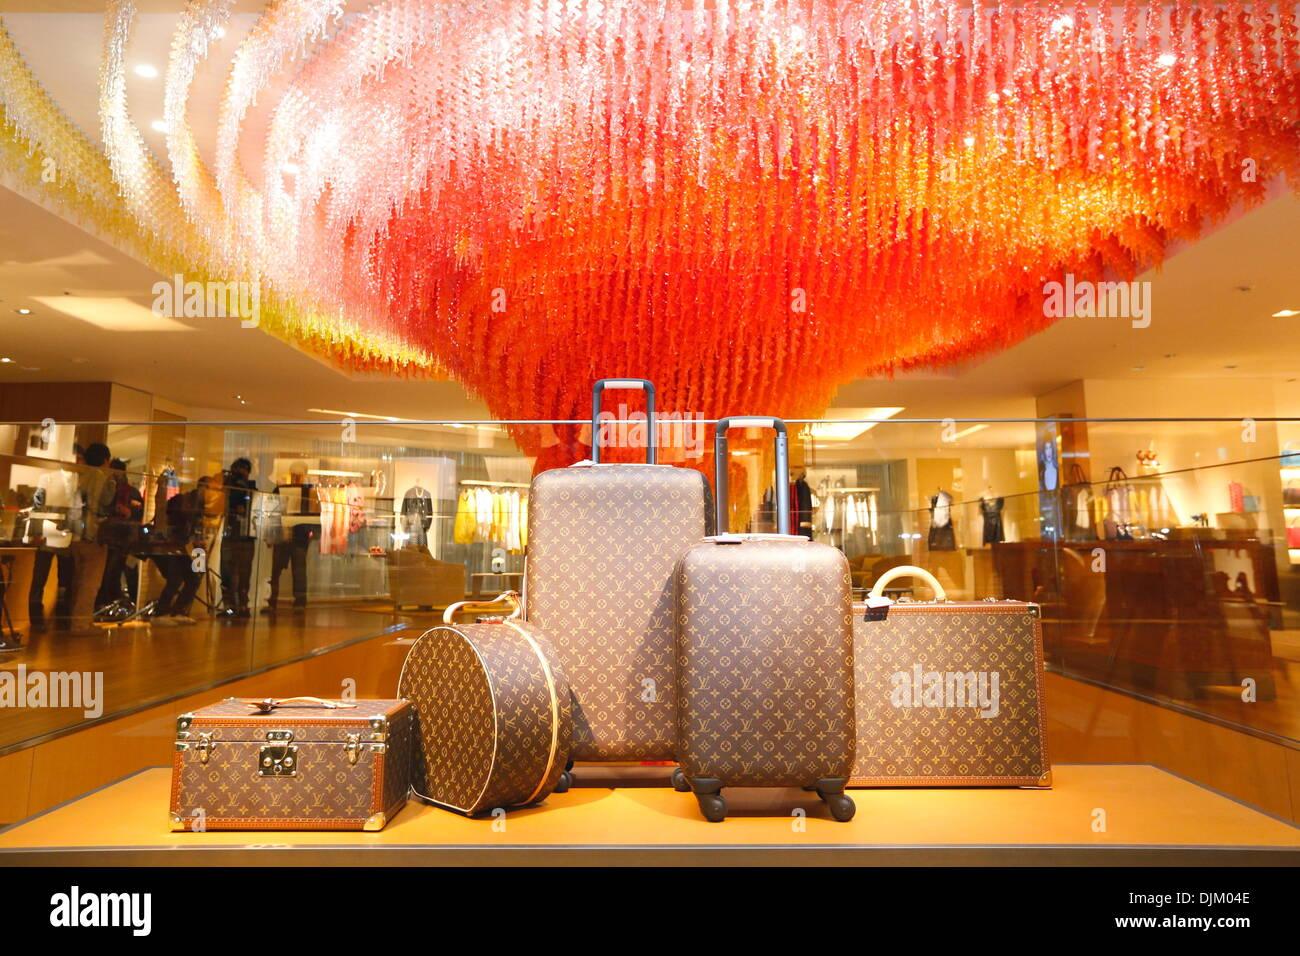 Tokyo, Japan. 28th Nov, 2013. Louis Vuitton store, Nov 28, 2013 : Open ceremony for 'LOUIS VUITTON ' store - Stock Image